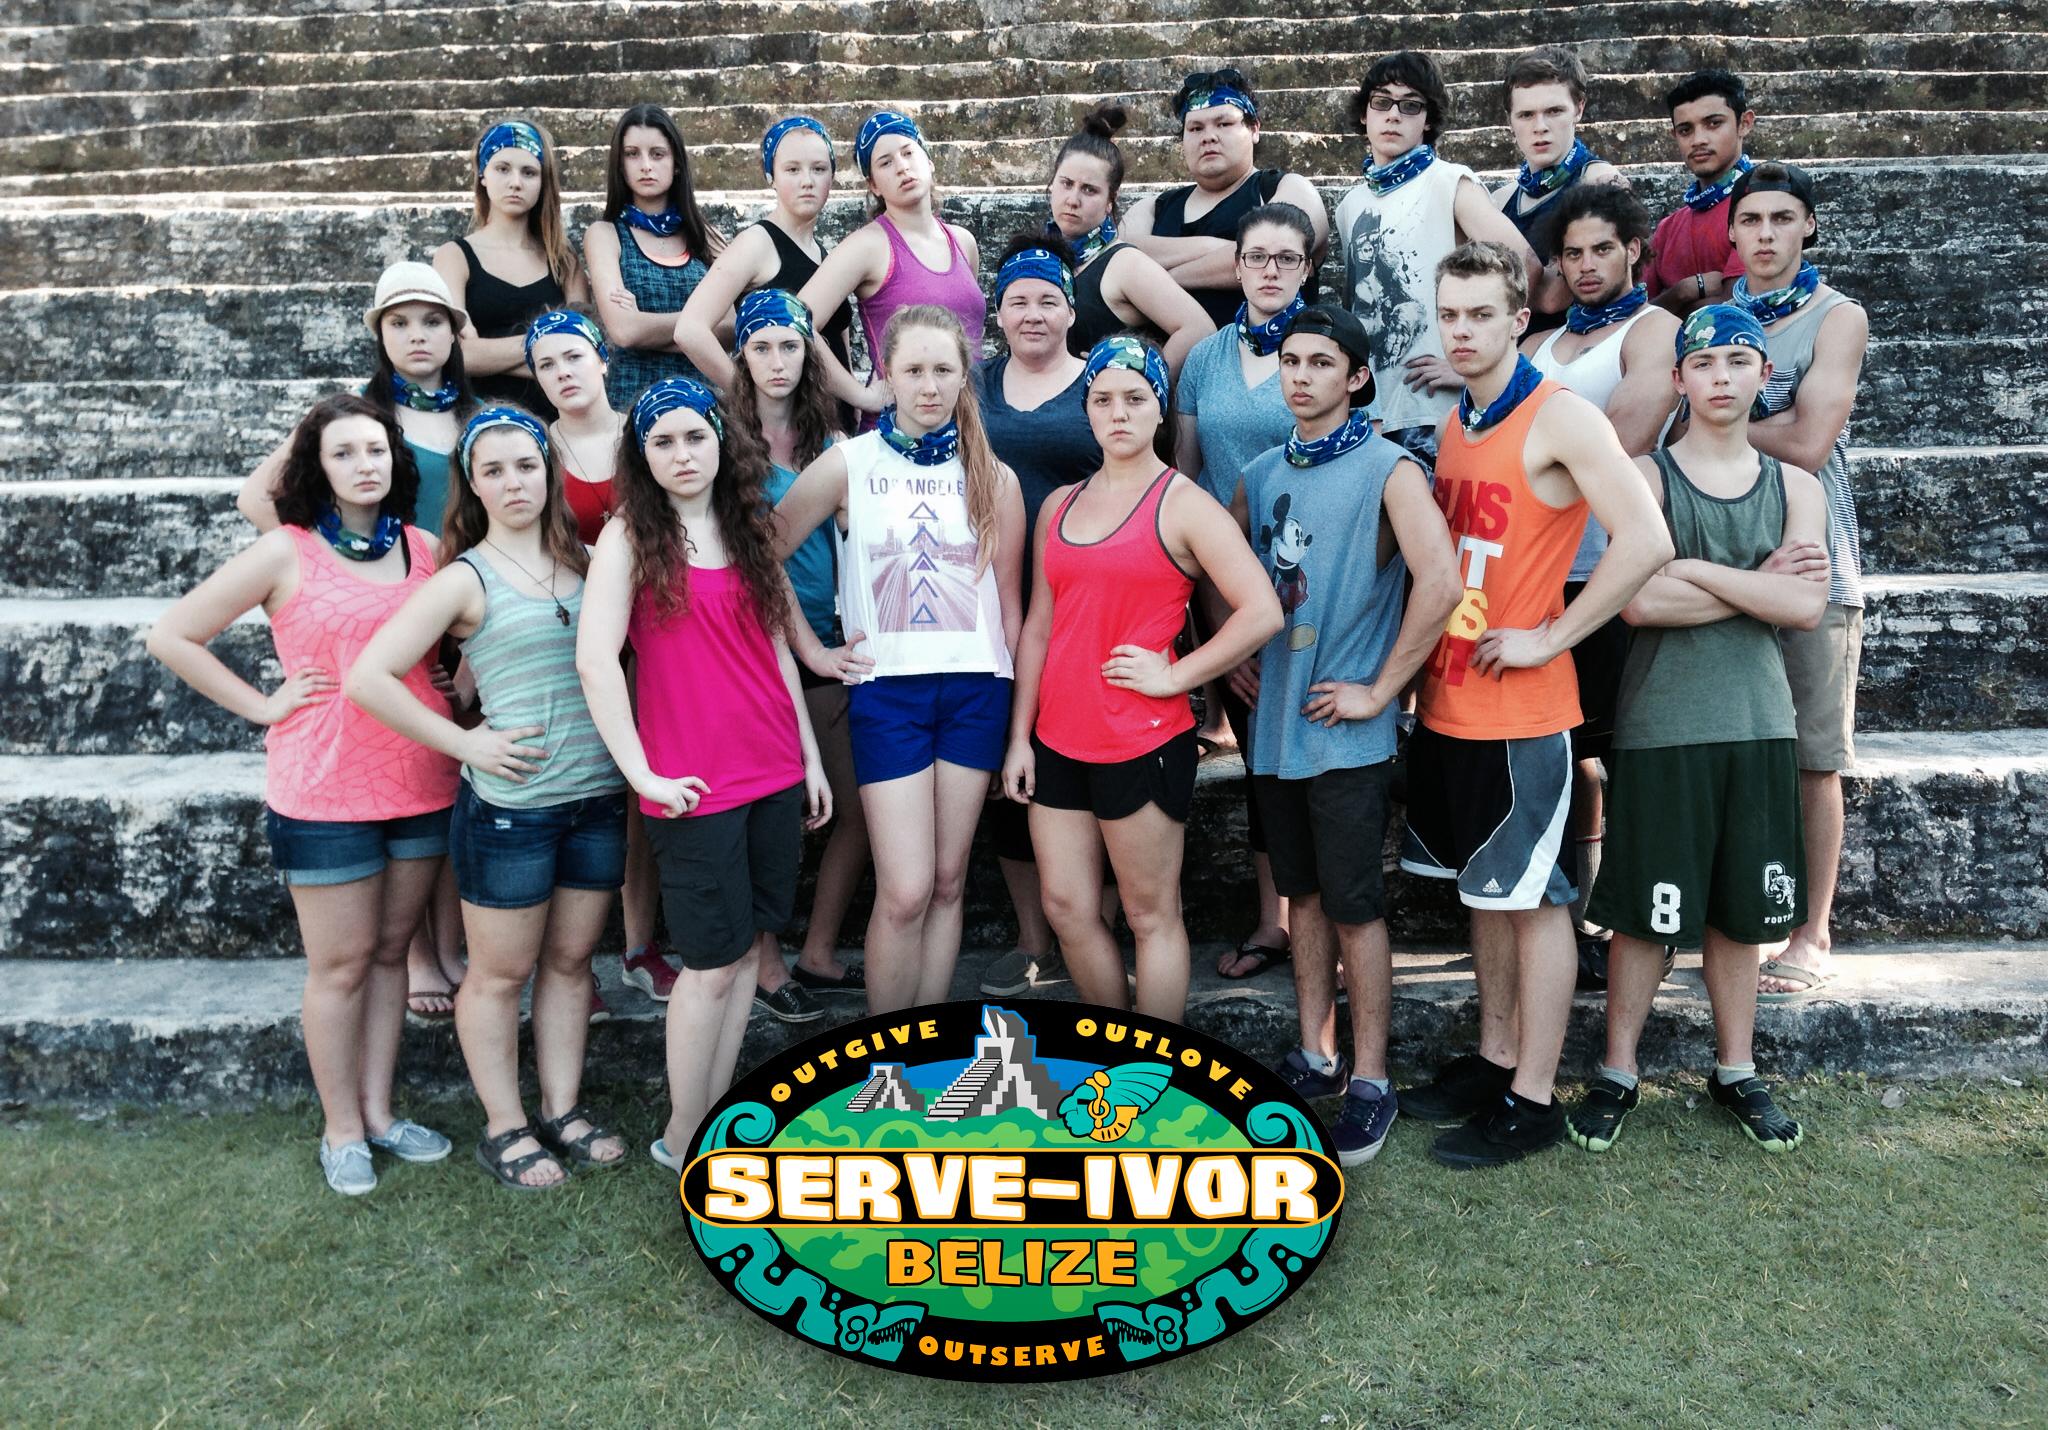 The official cast photo of SERVE-IVOR BELIZE!!!